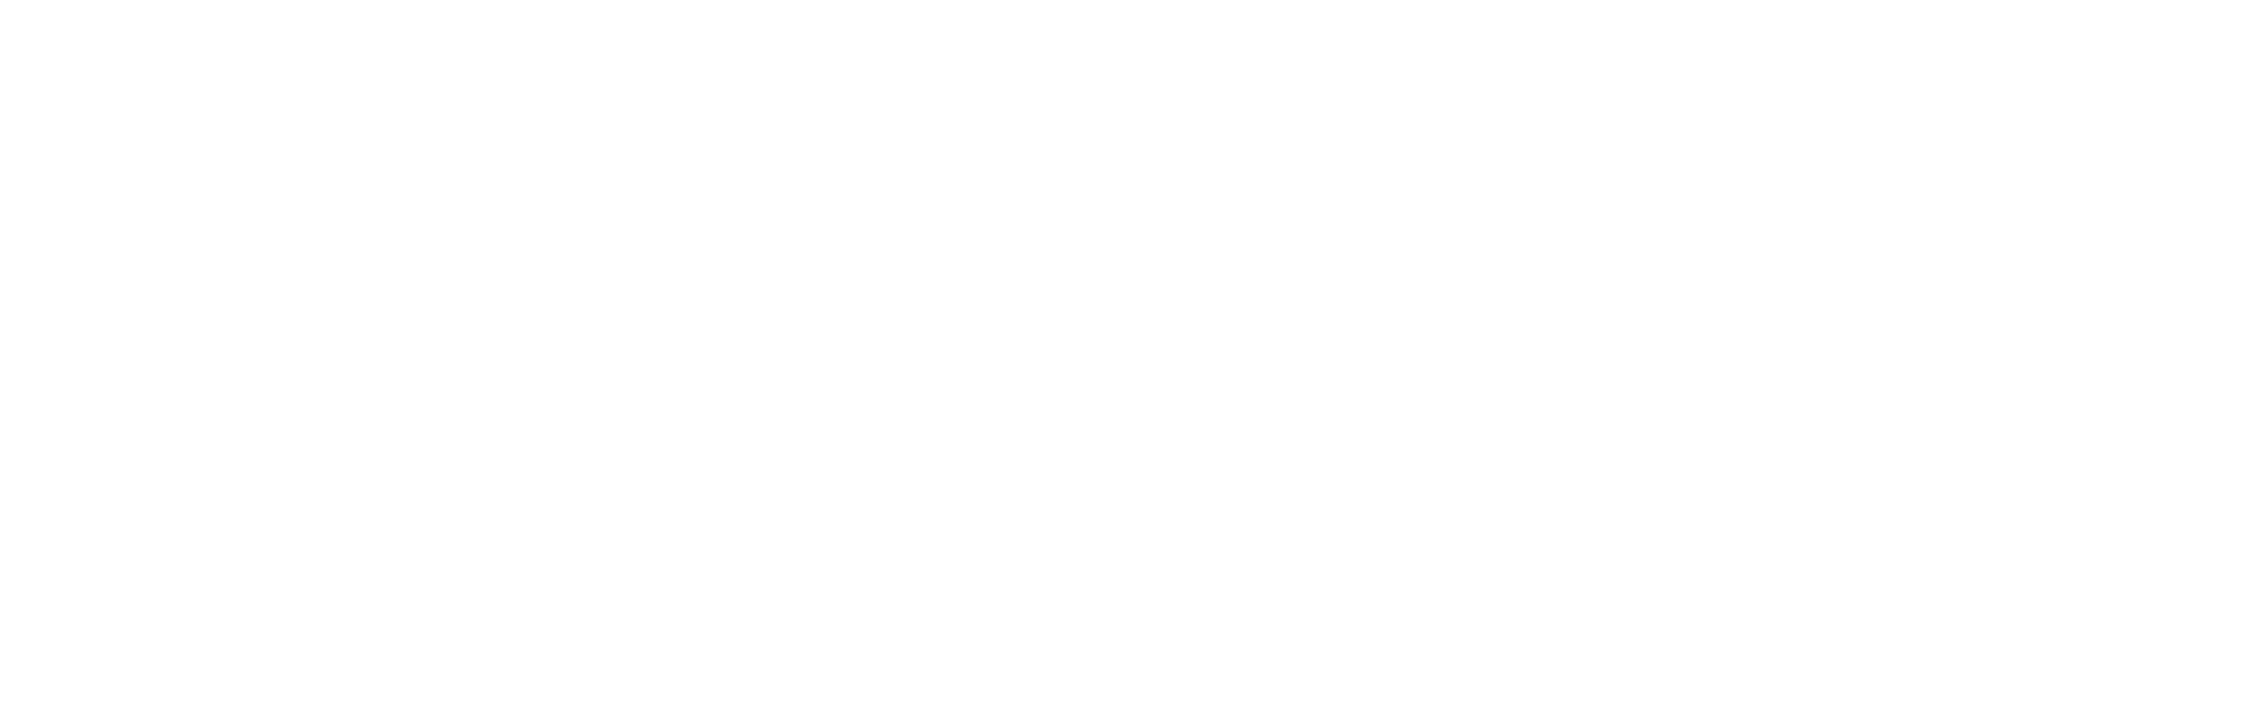 Rigged Mind logo